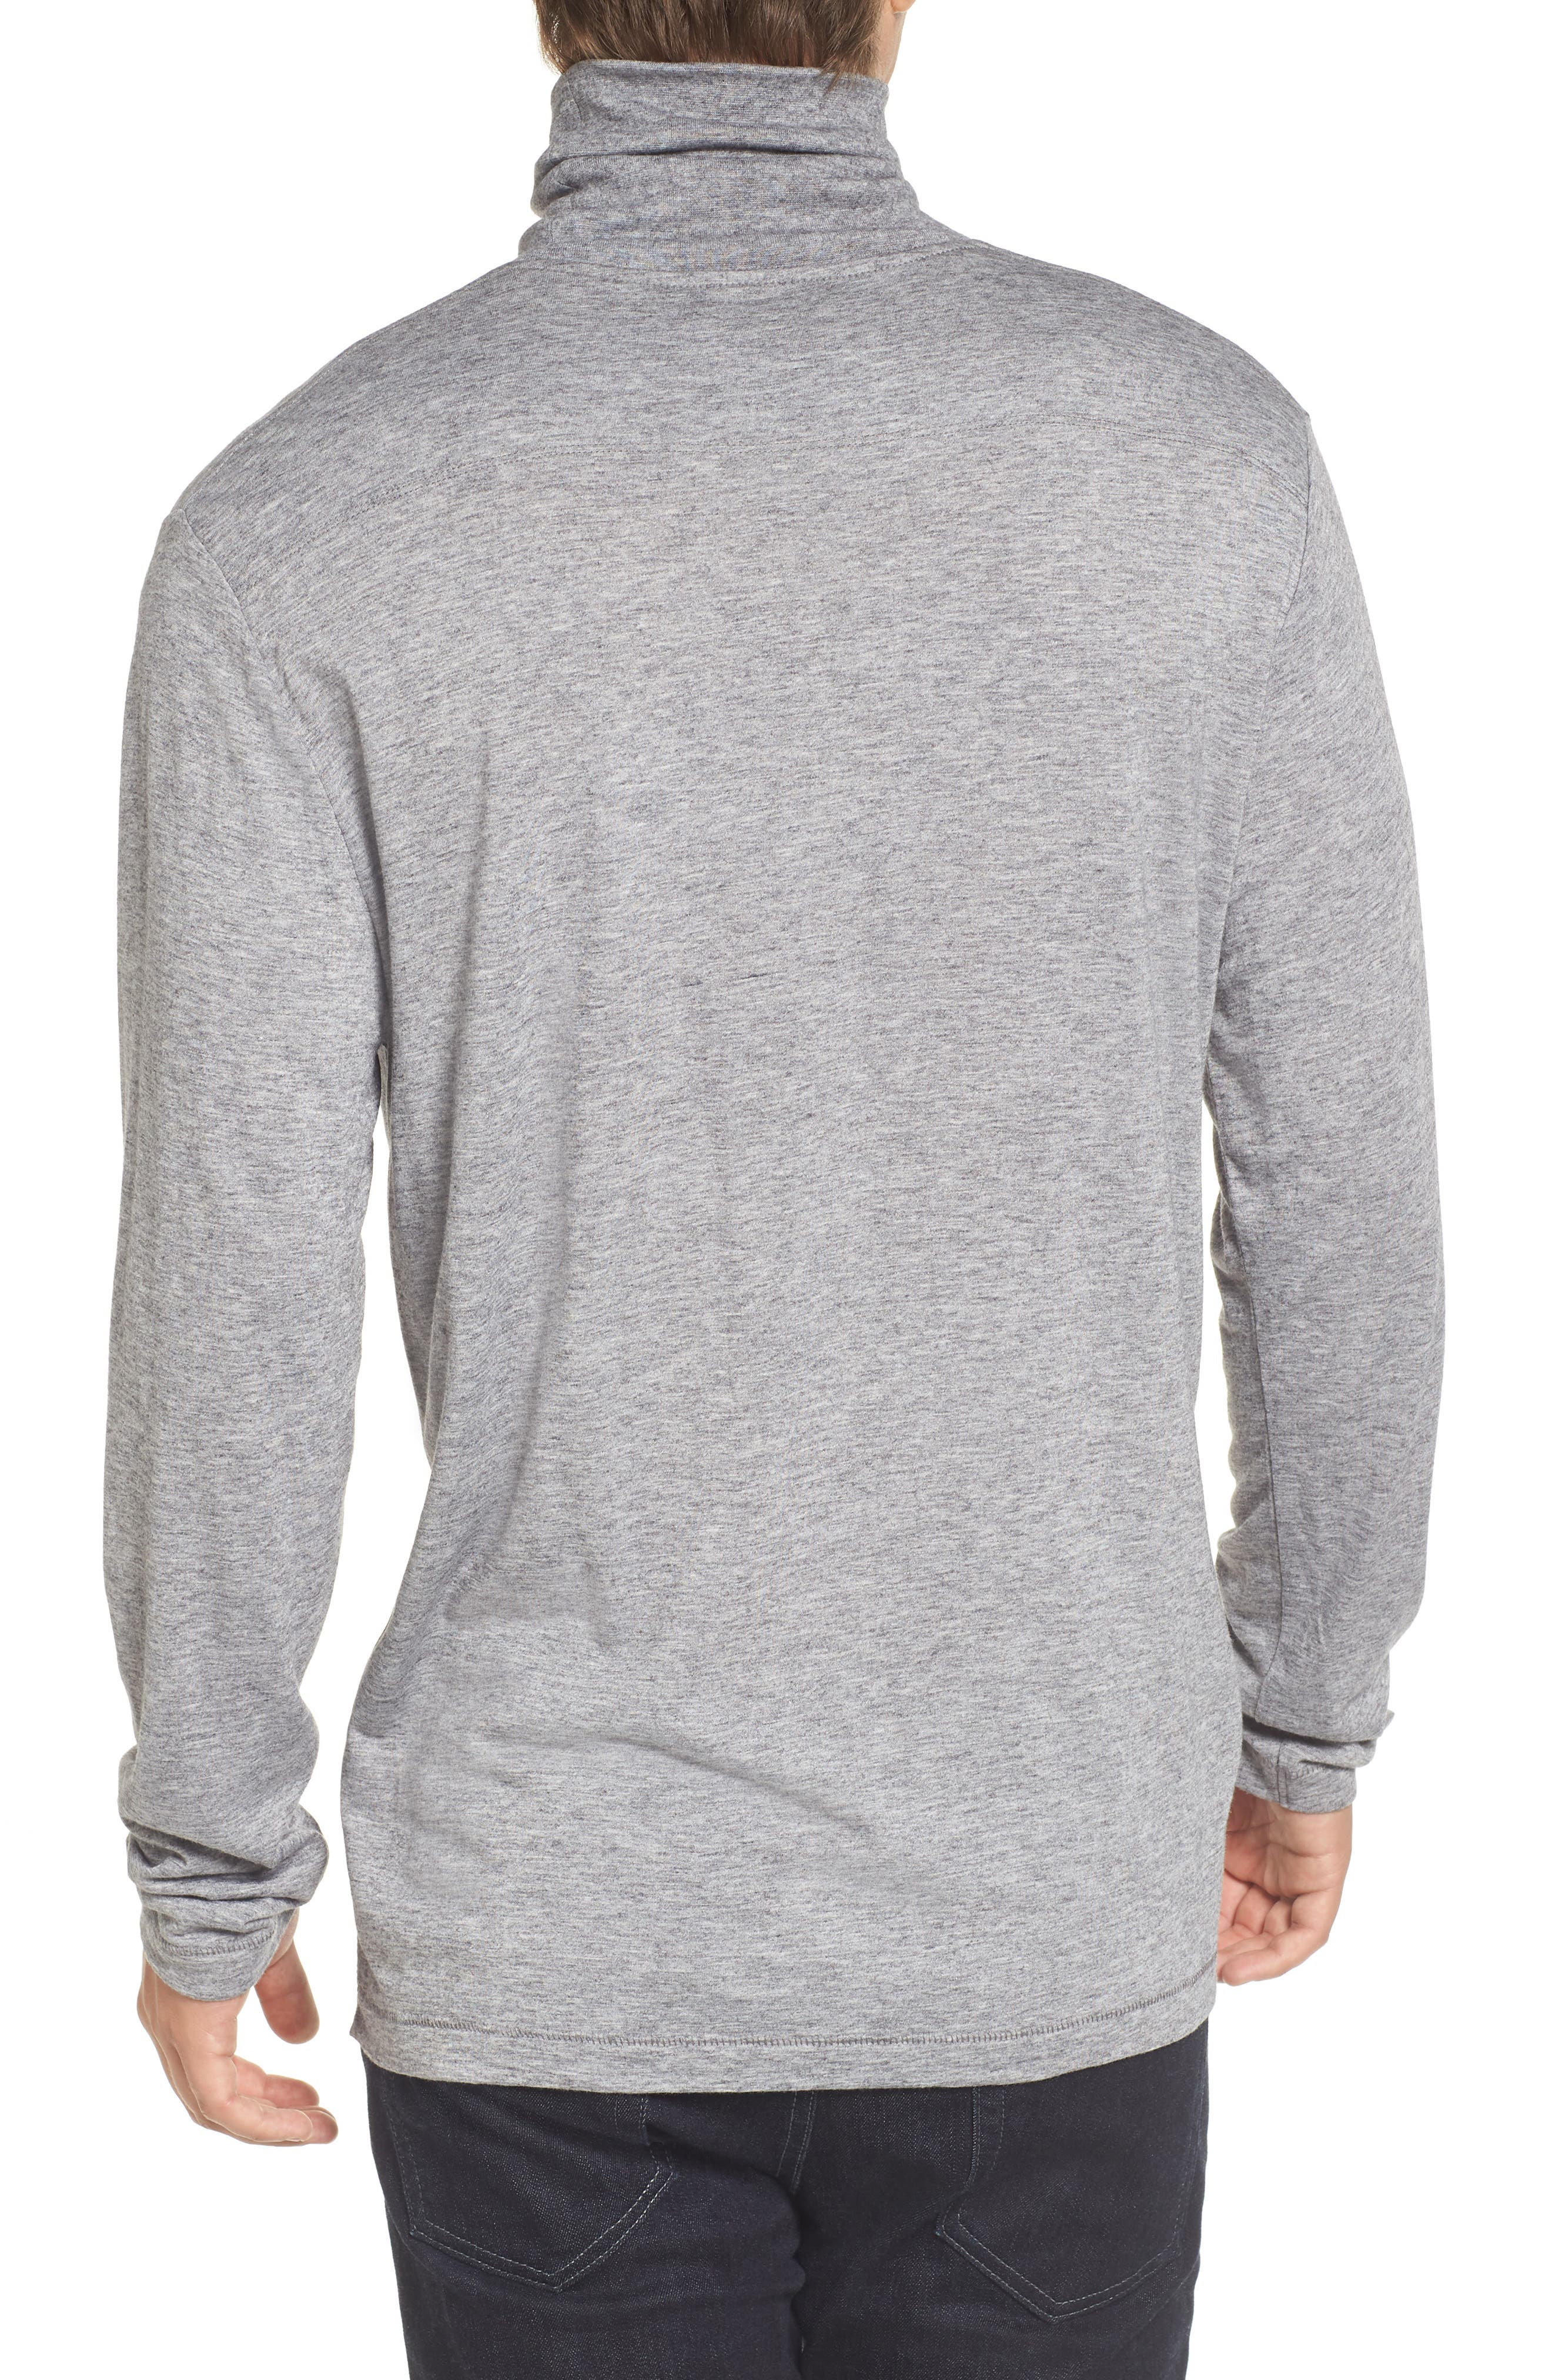 Lightweight Turtleneck Sweater,                             Alternate thumbnail 2, color,                             Grey Melange